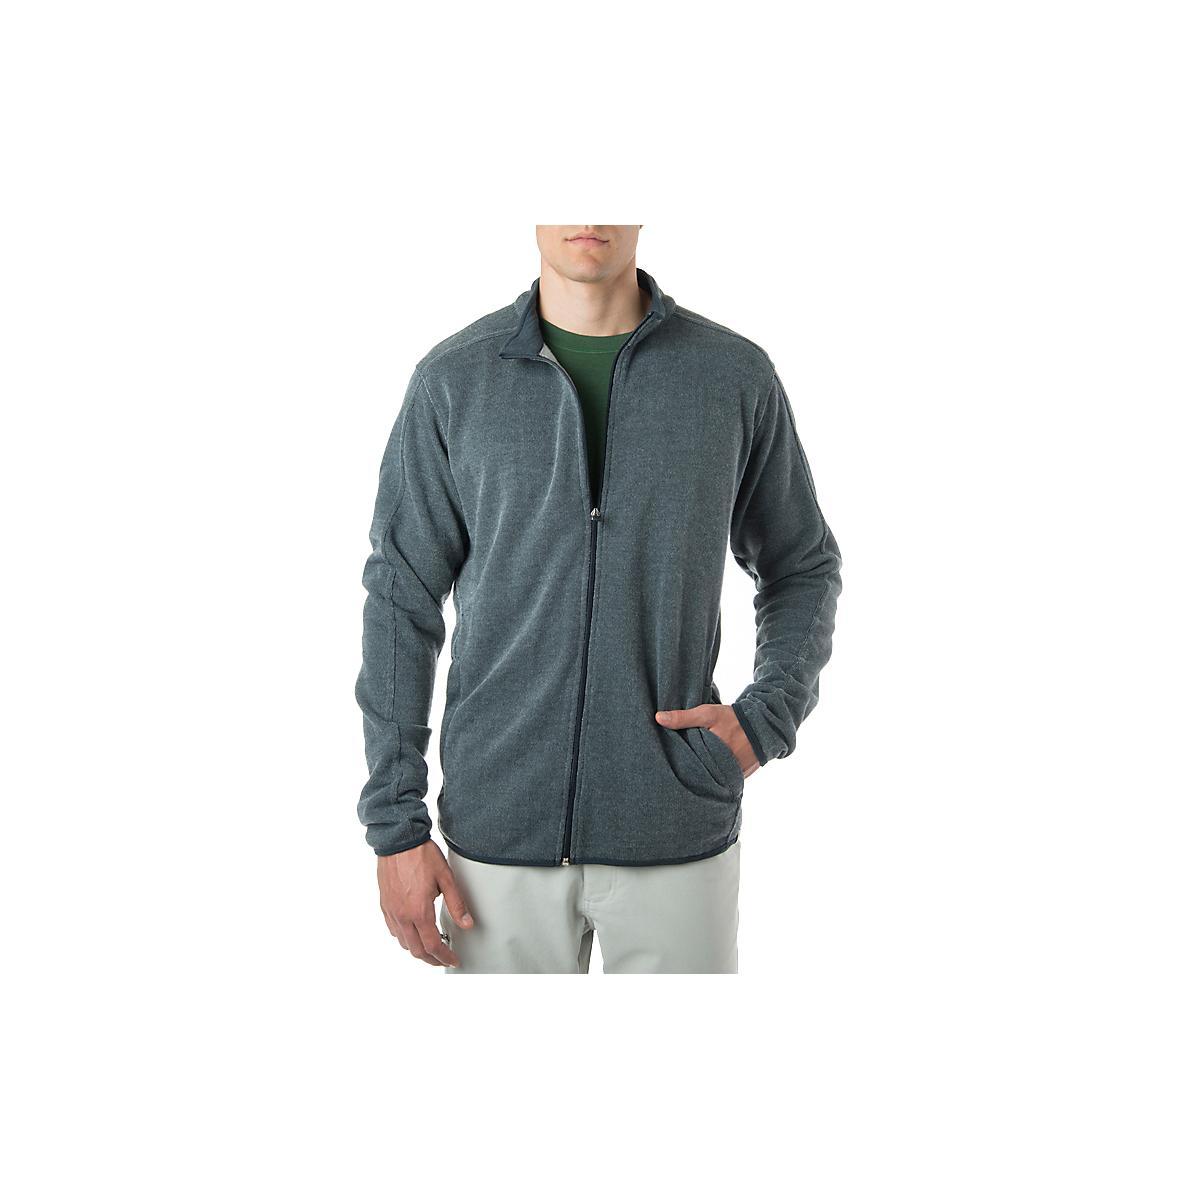 Men's Tasc Performance�Transcend Fleece Jacket